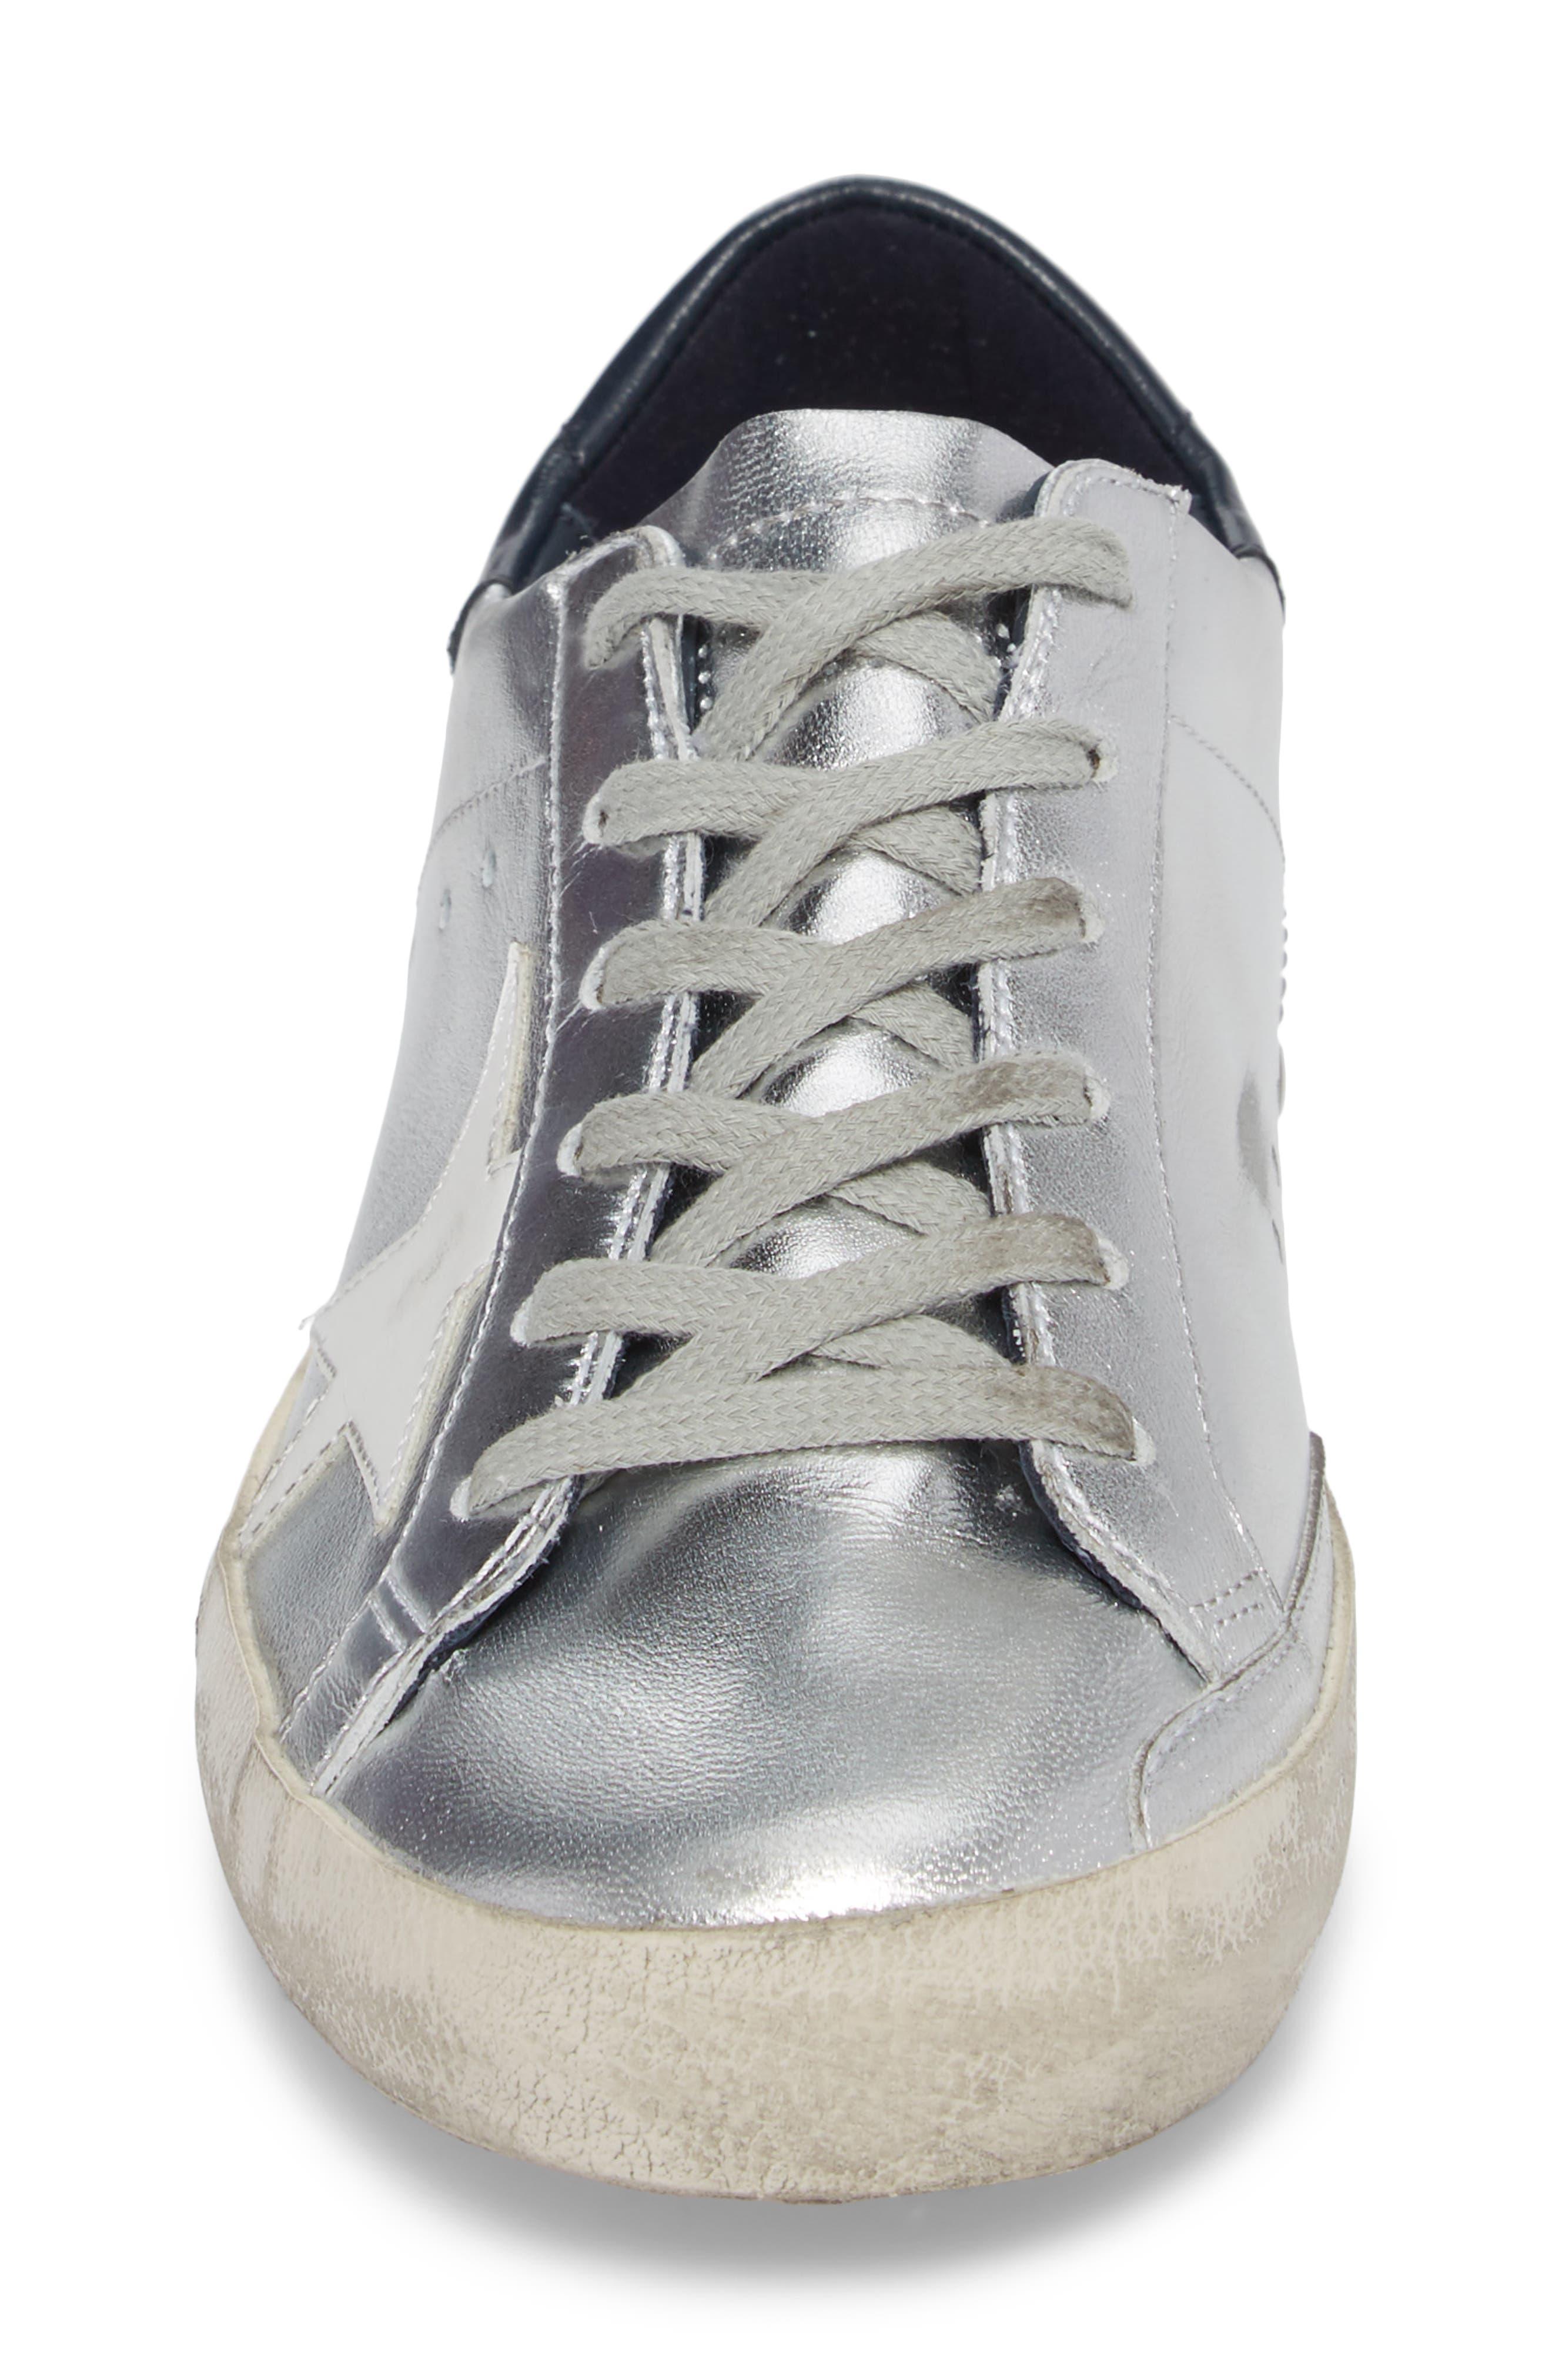 Superstar Metallic Low Top Sneaker,                             Alternate thumbnail 4, color,                             Silver